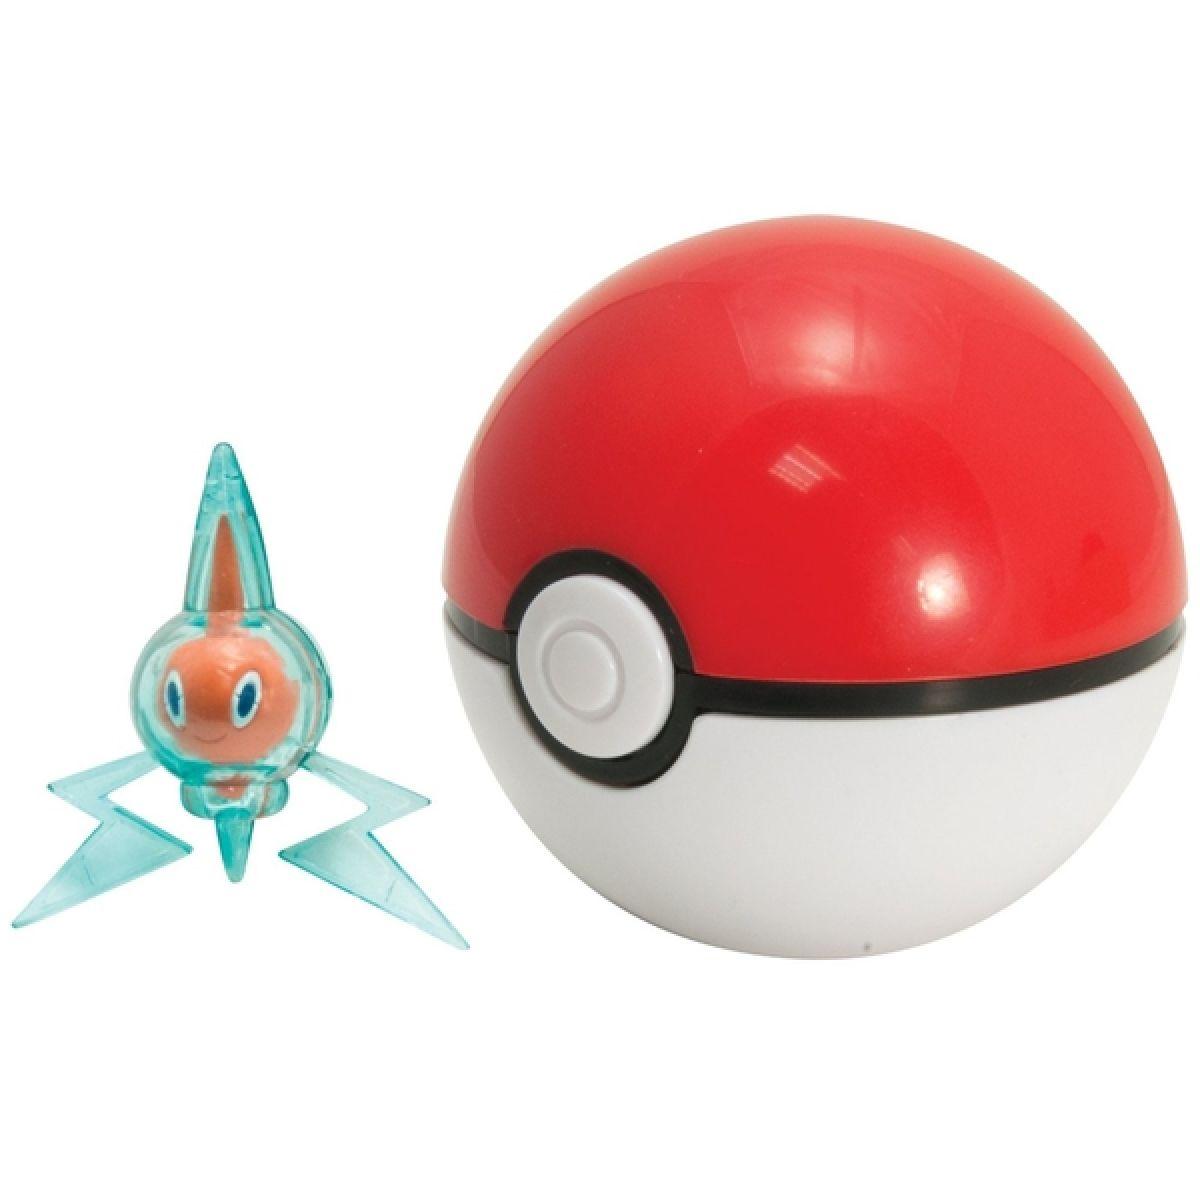 Pokémon Pokéball s figurkou - Rotom